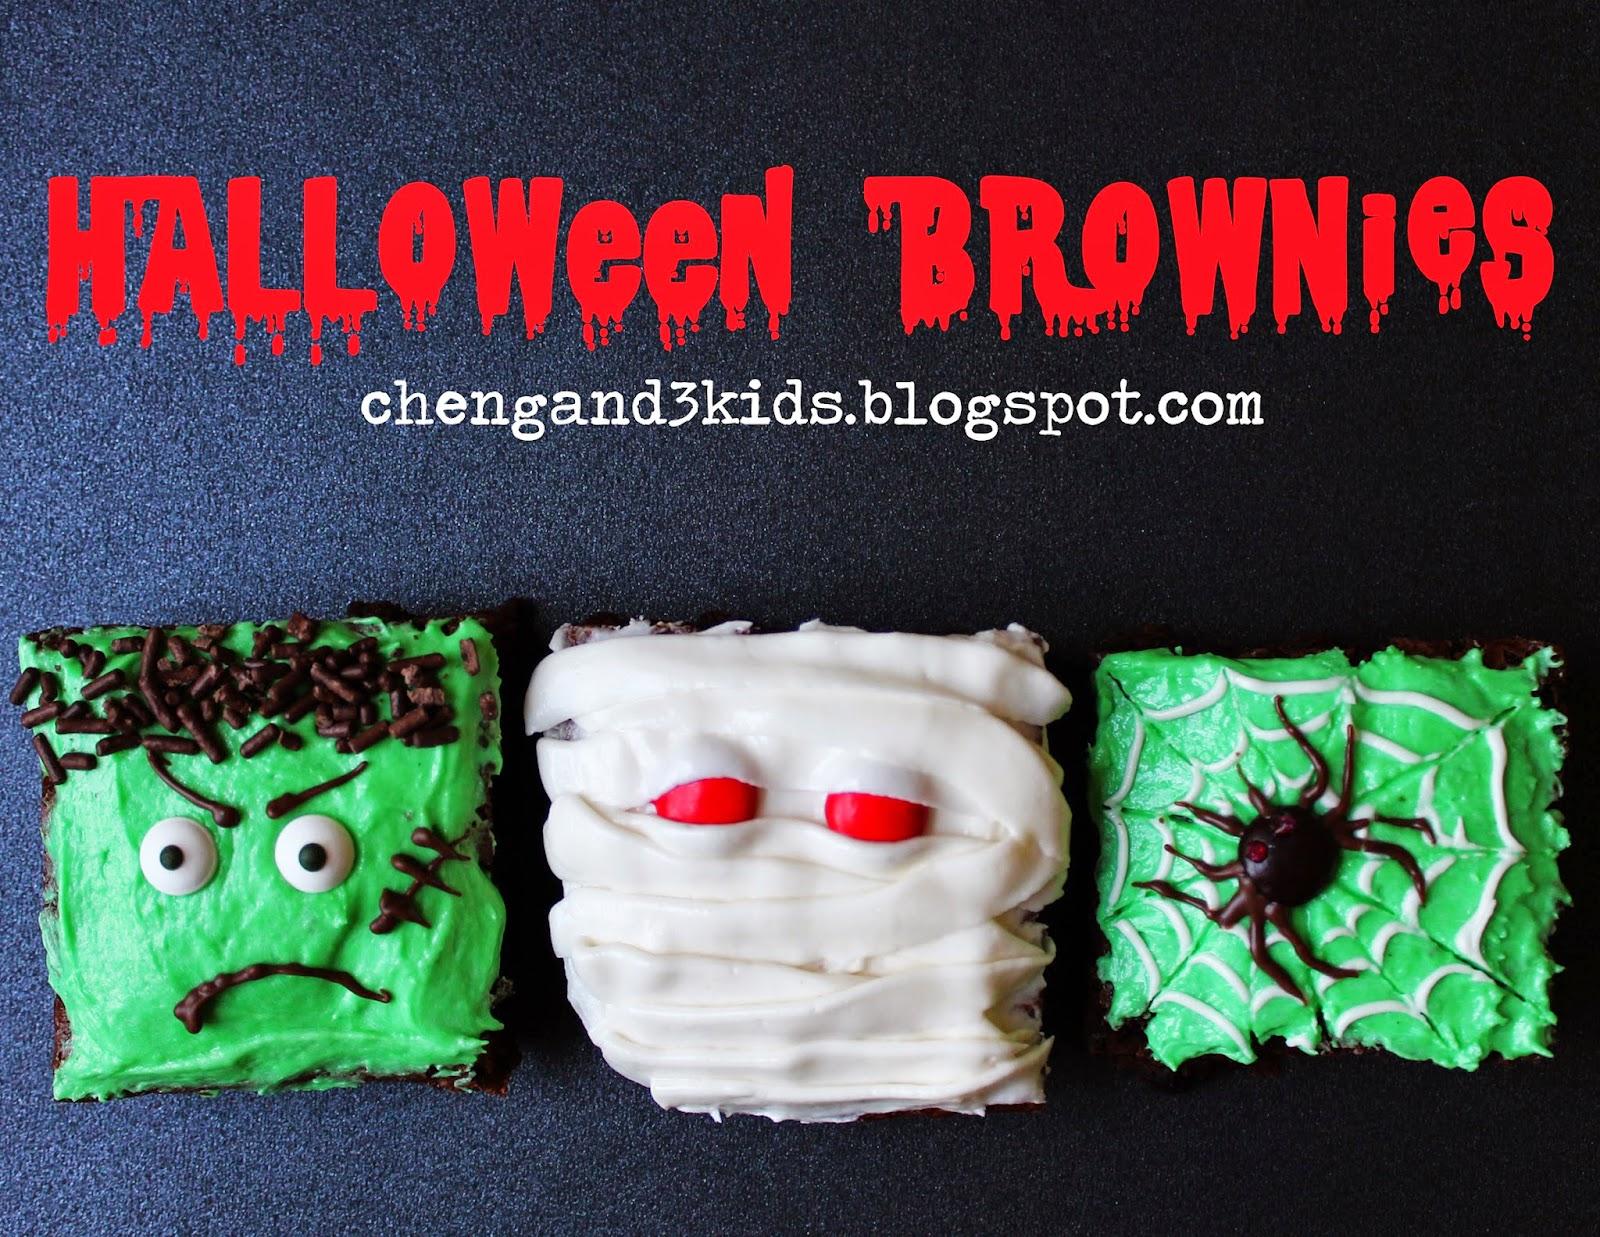 Halloween Brownies -- Frankenstein Brownie, Mummy Brownie, and Spider Brownie by chengand3kids.blogspot.com